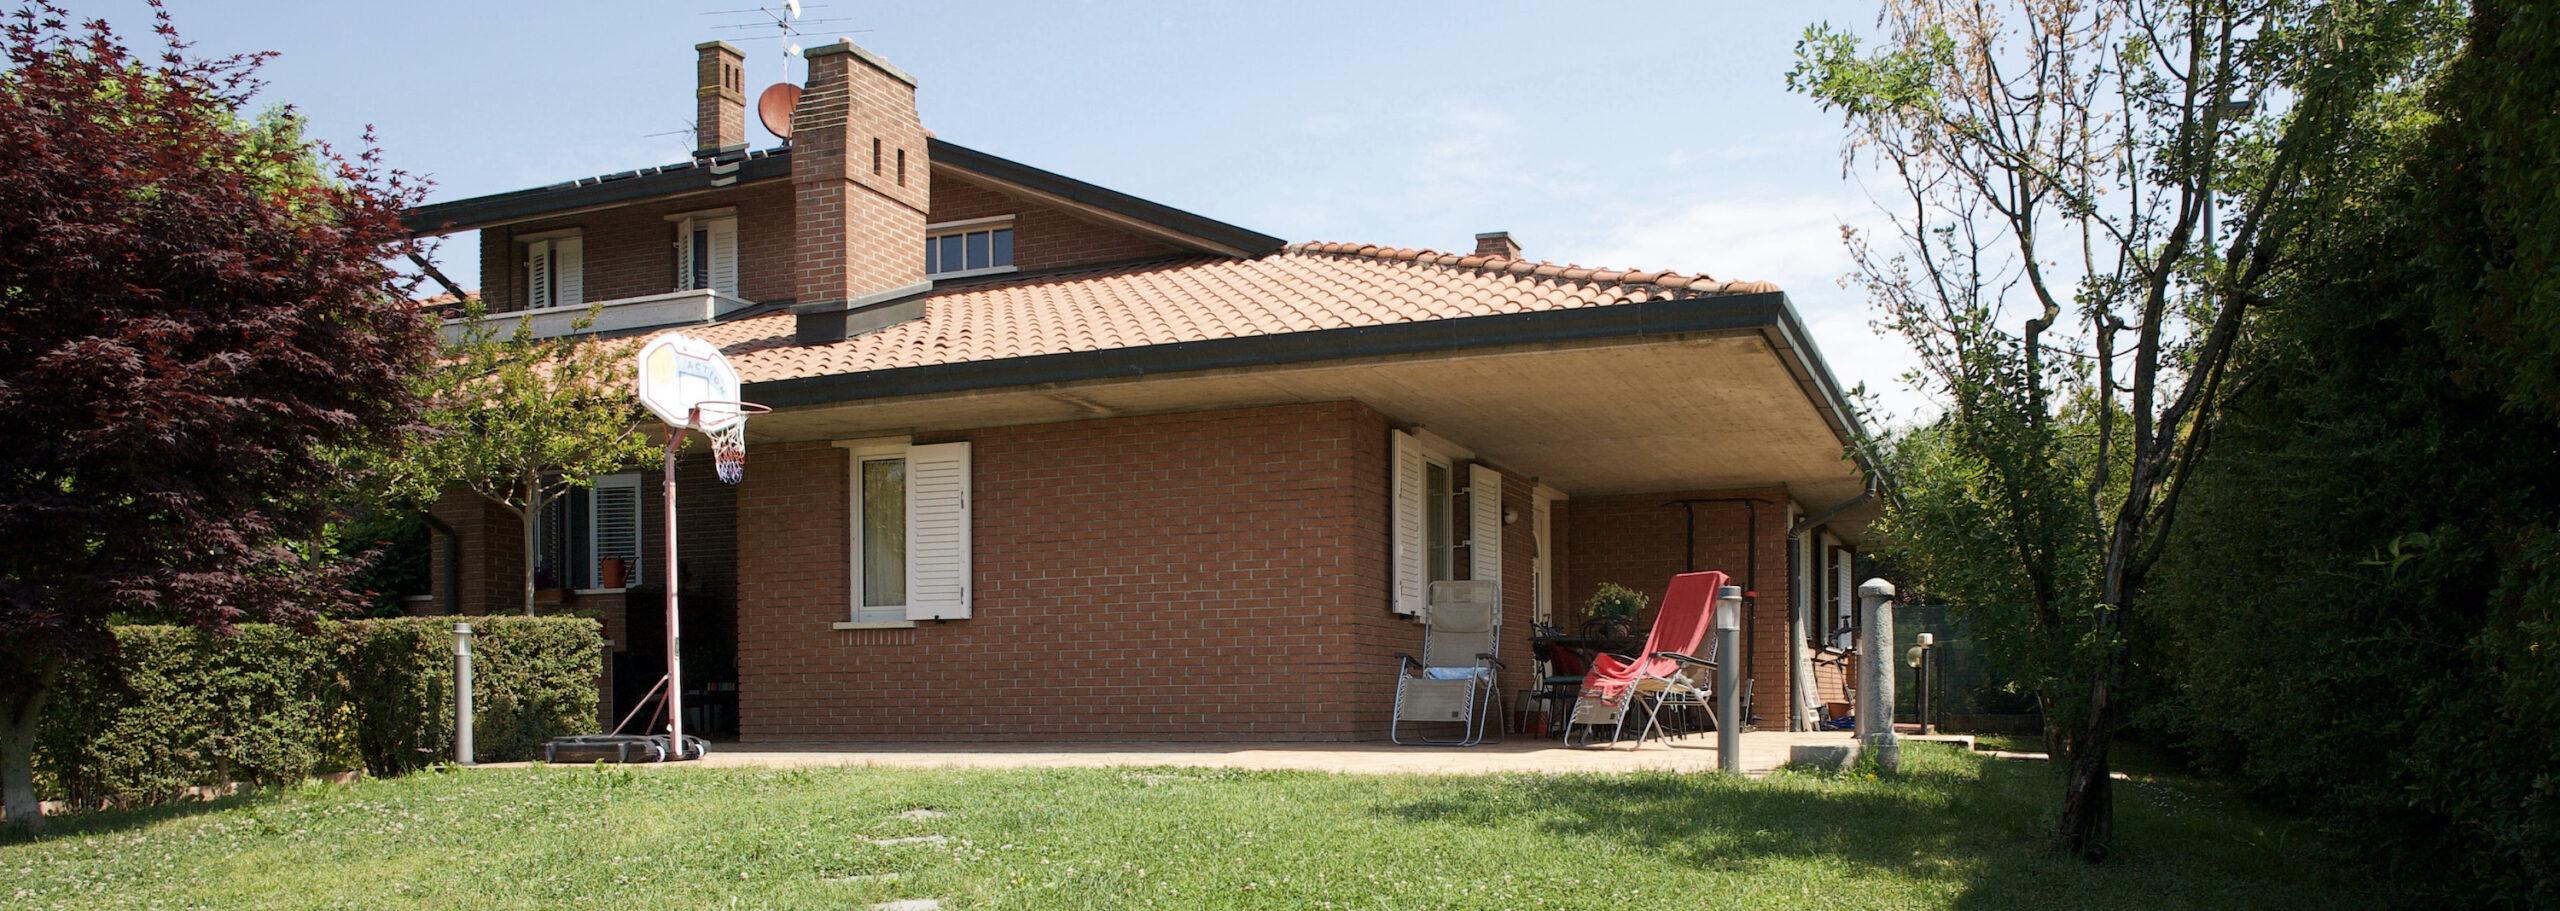 Villa bifamiliare a Calvenzano